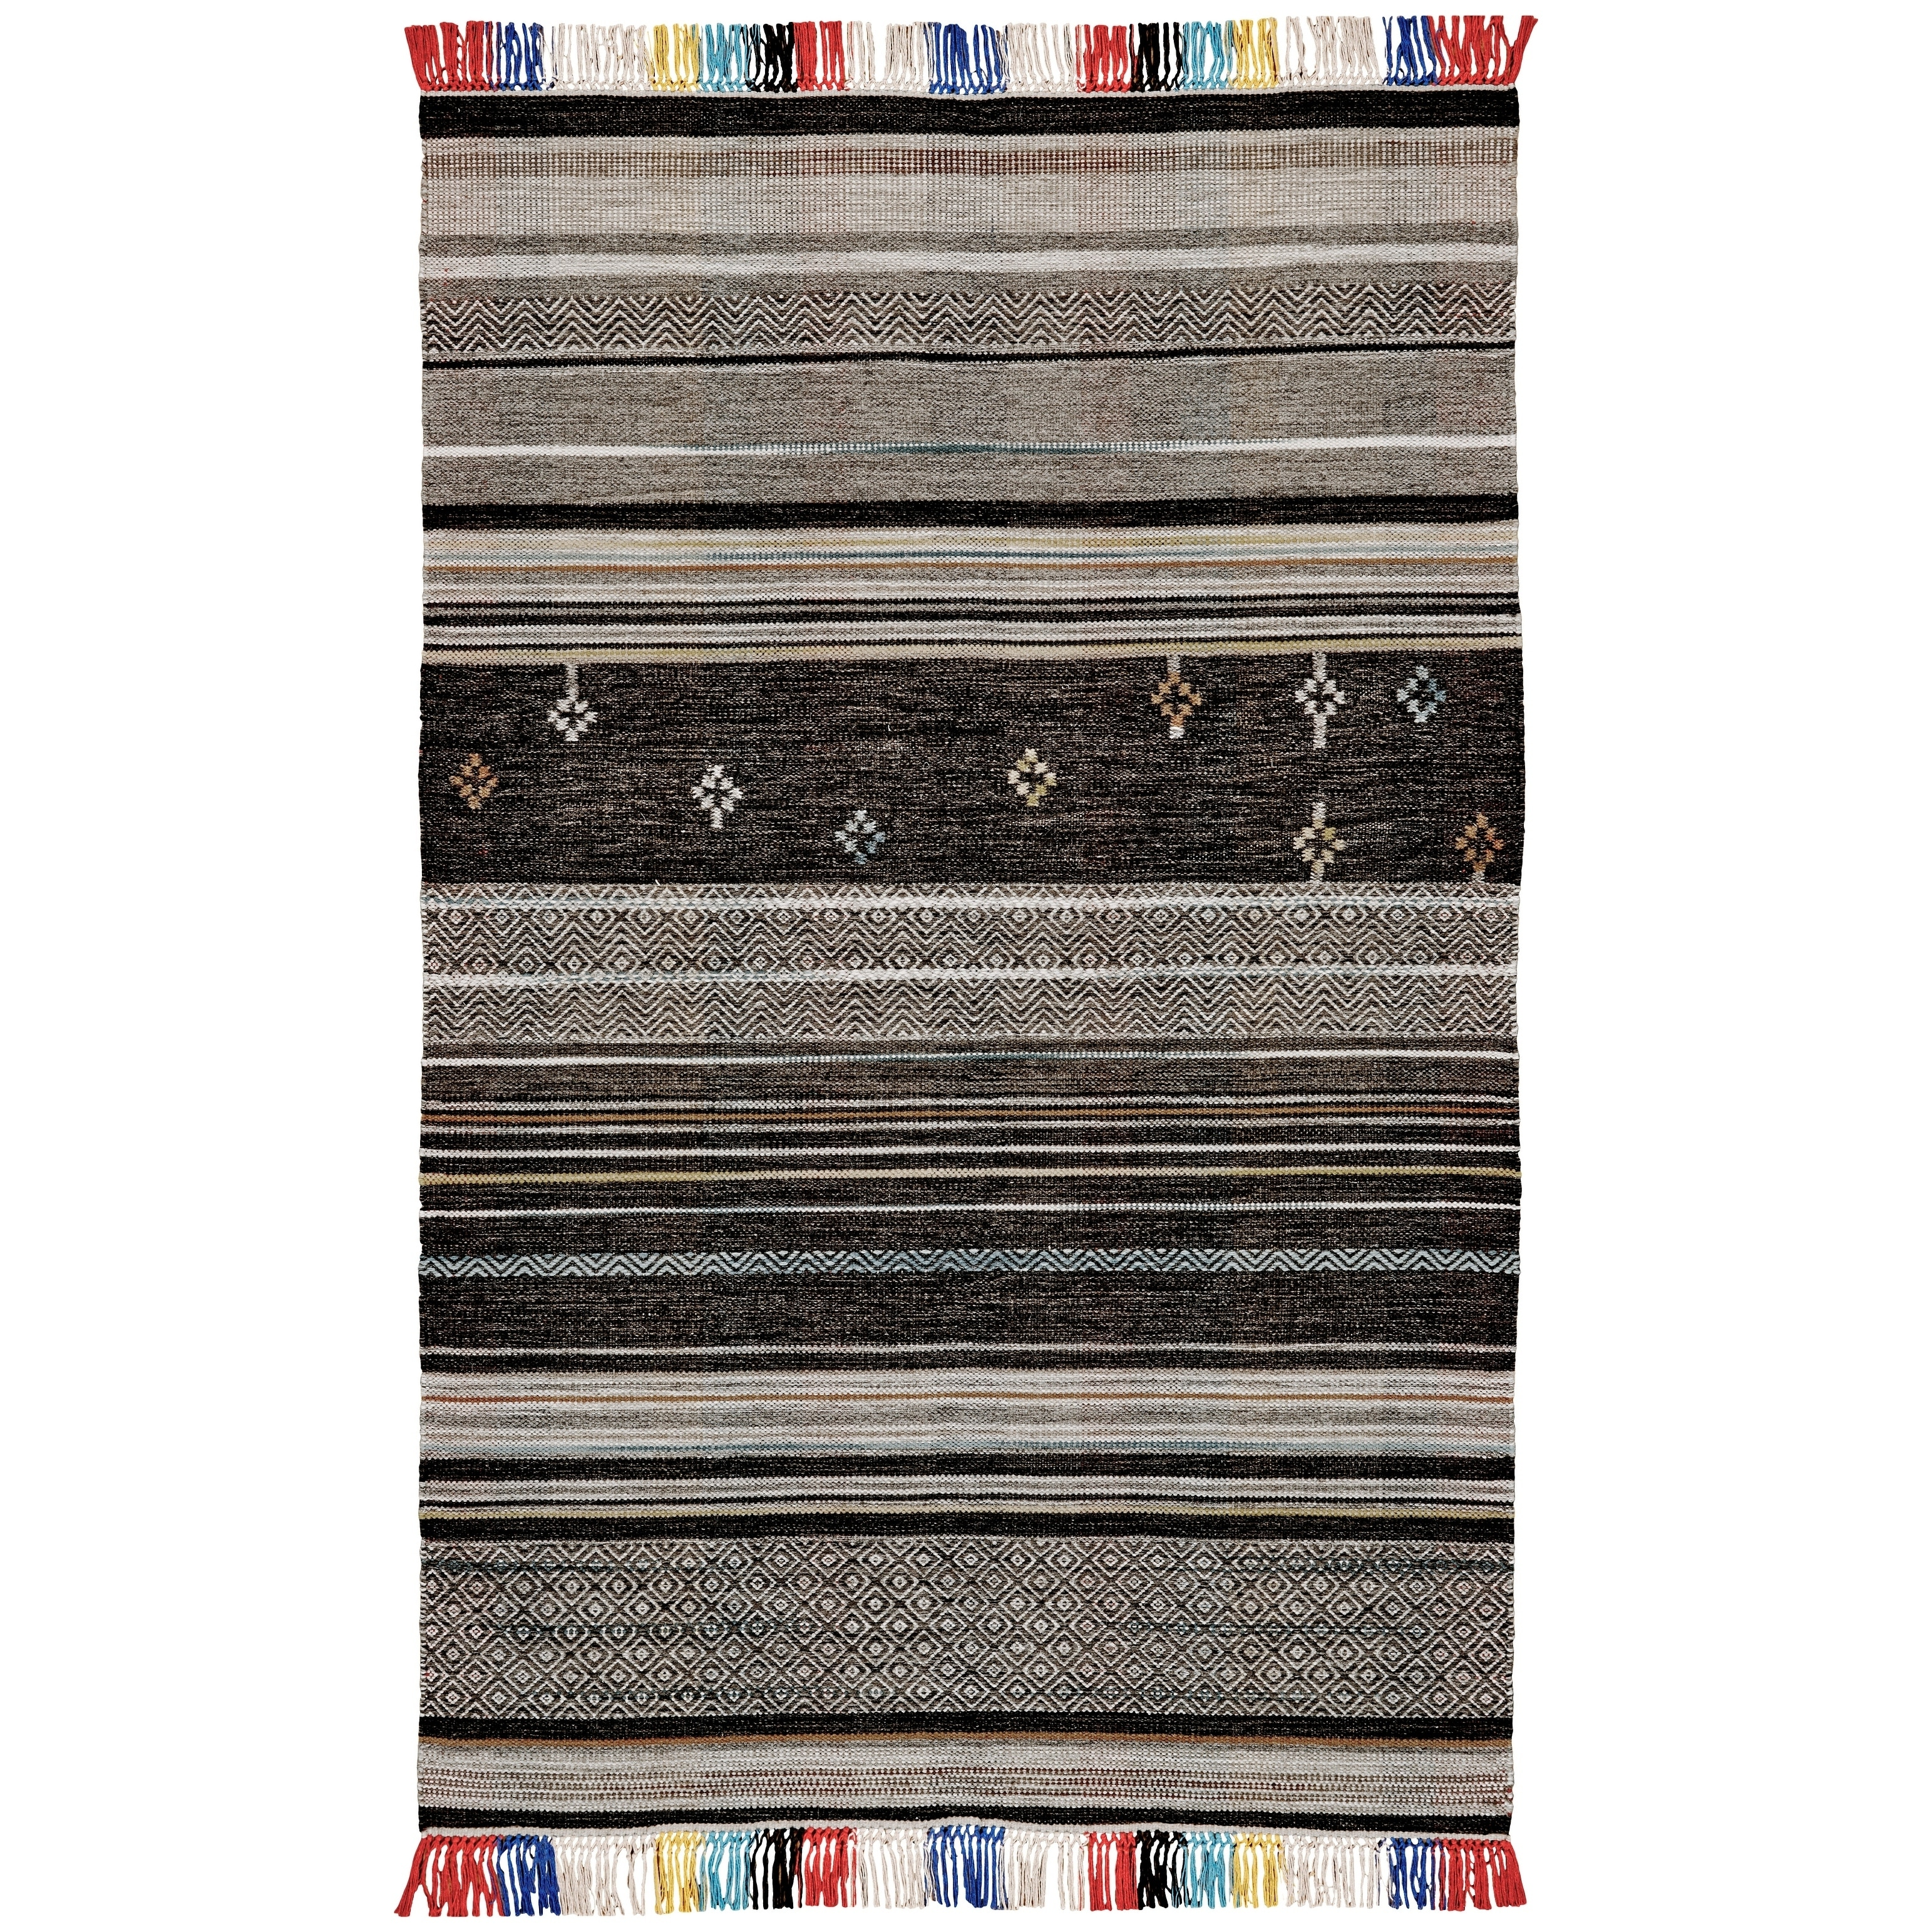 Grand Bazaar Mirella Gray/ Multi Wool Rug (5 X 8) - 5 x 8 (Grey/Multi - 5 x 8)